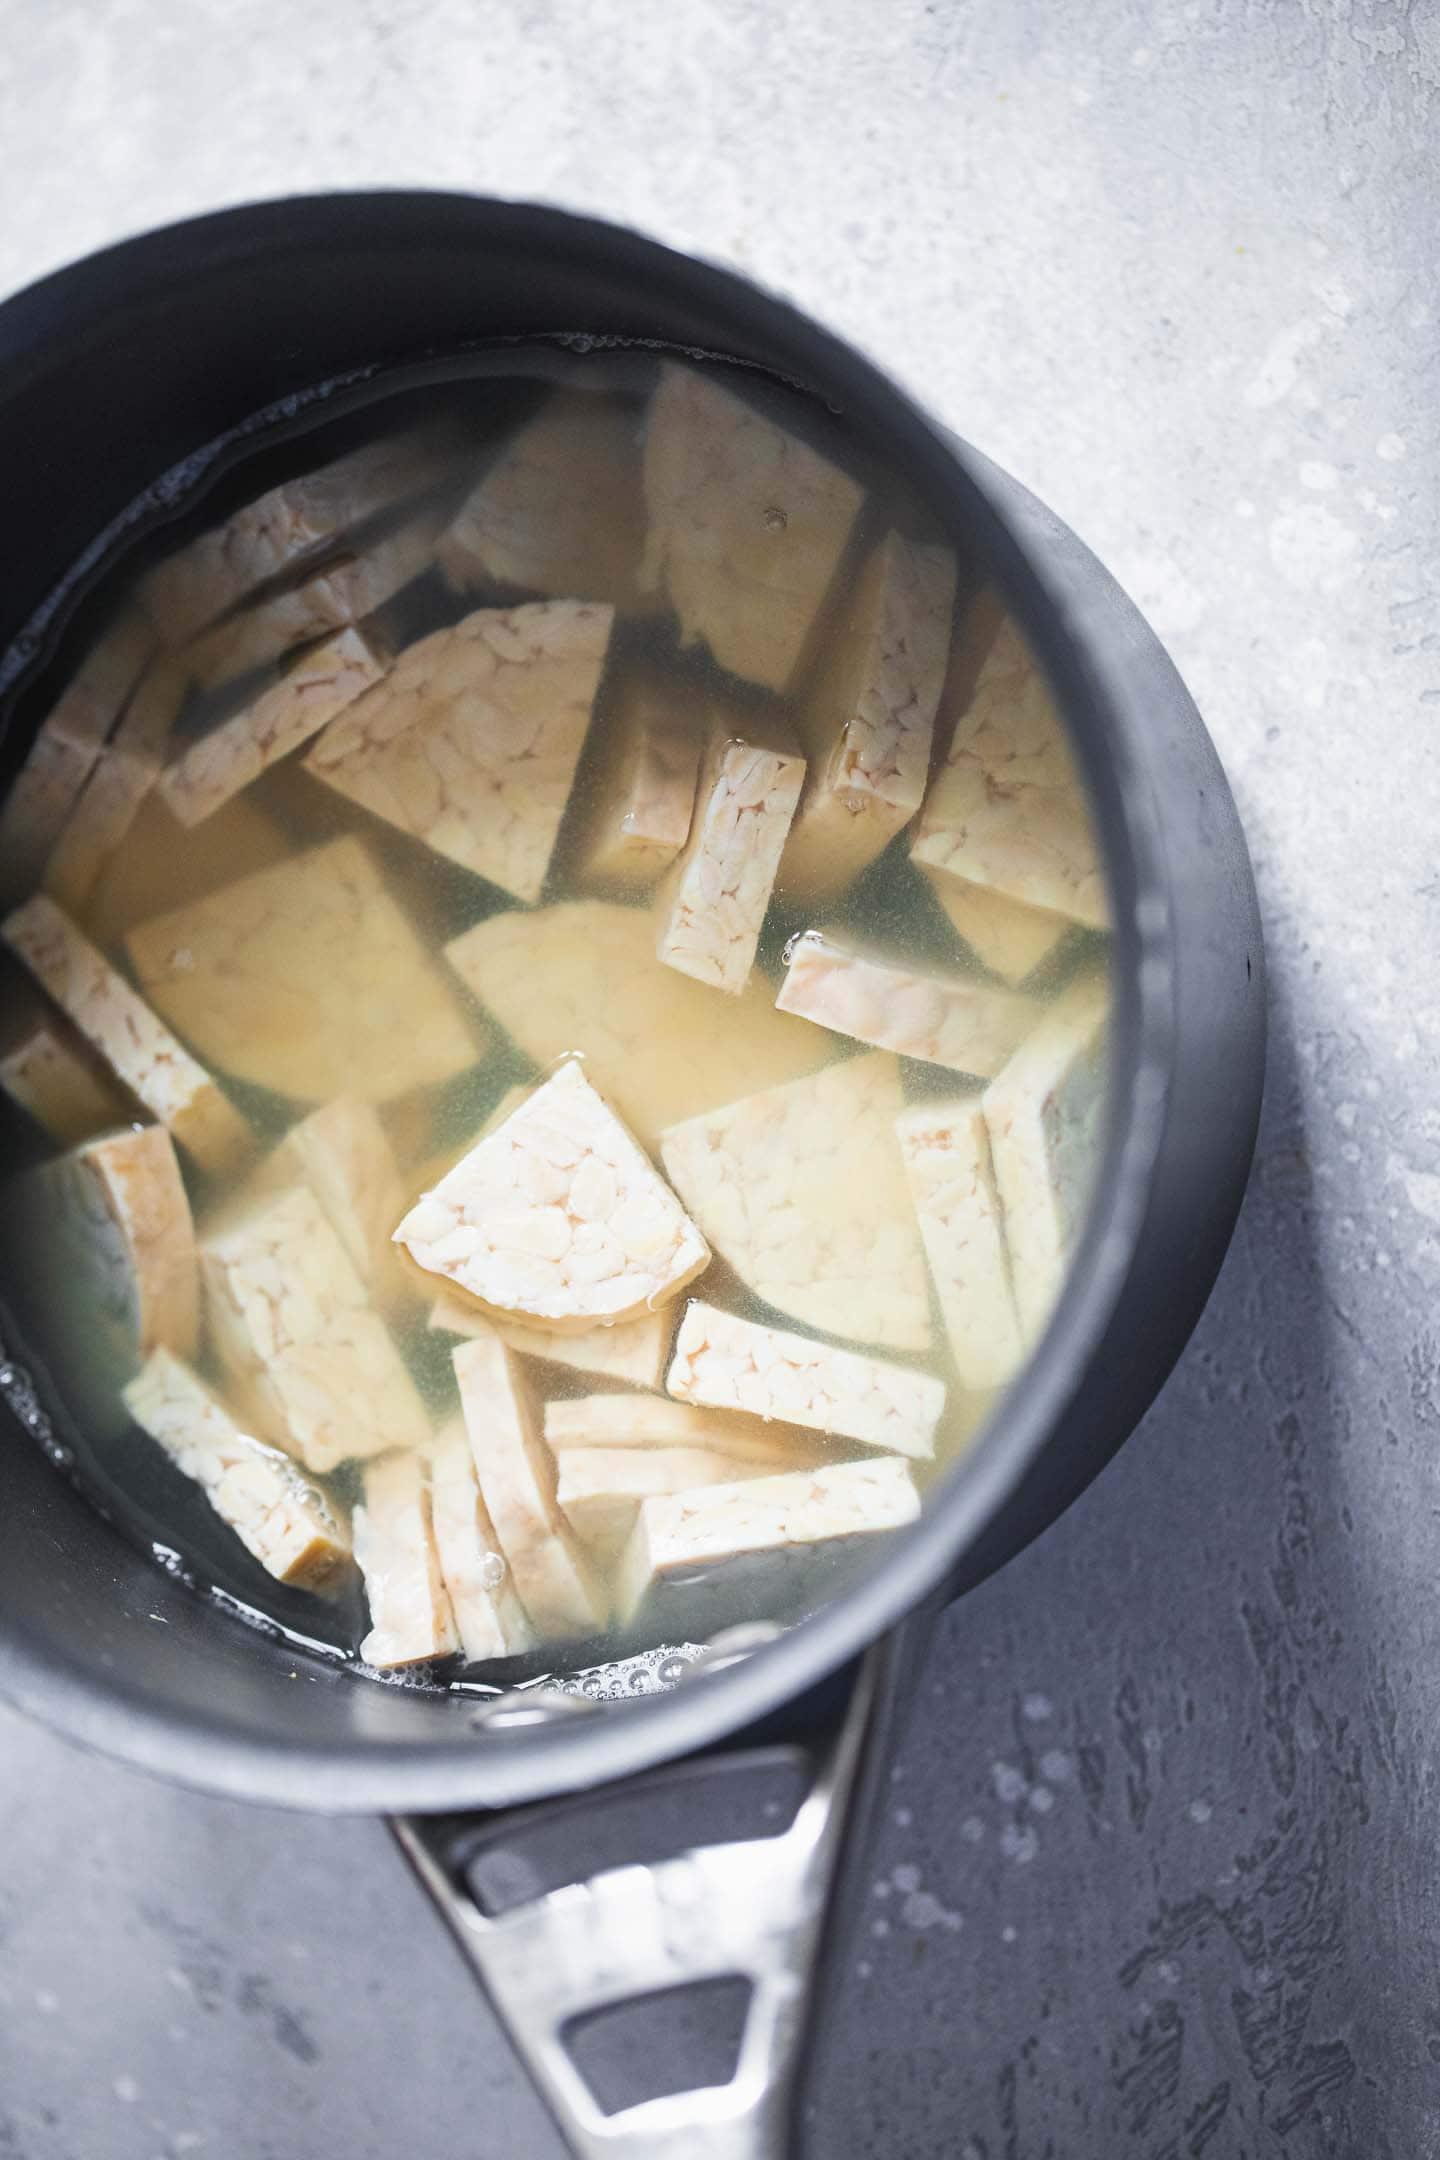 Tempeh in a saucepan